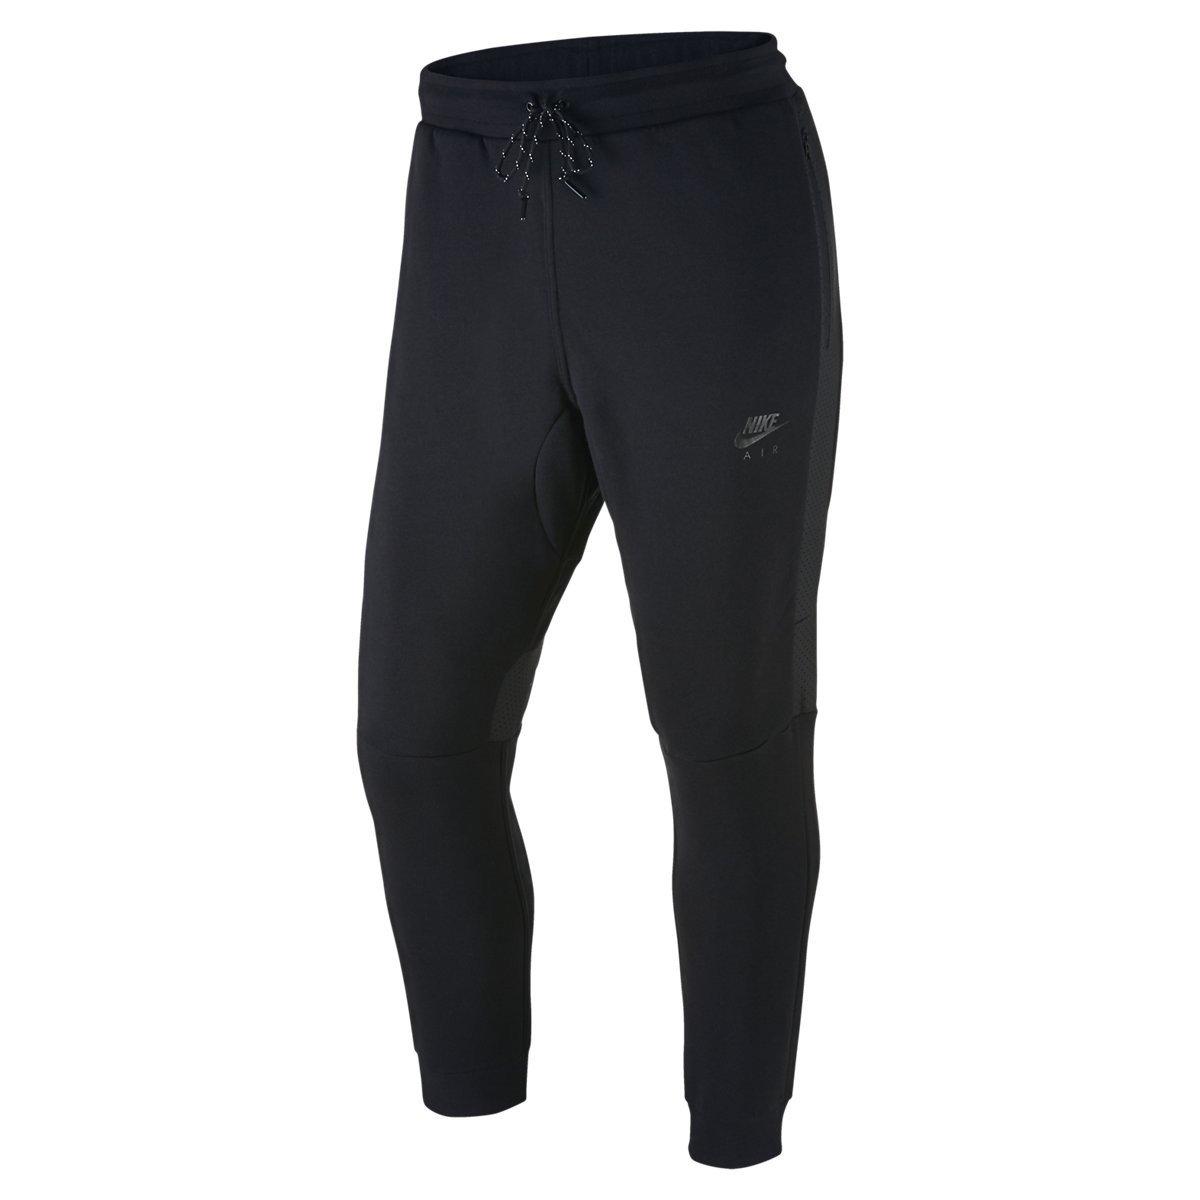 bfce7a869dbc3 Amazon.com: Nike Air Hybrid Mens Joggers Black/Black: Sports & Outdoors